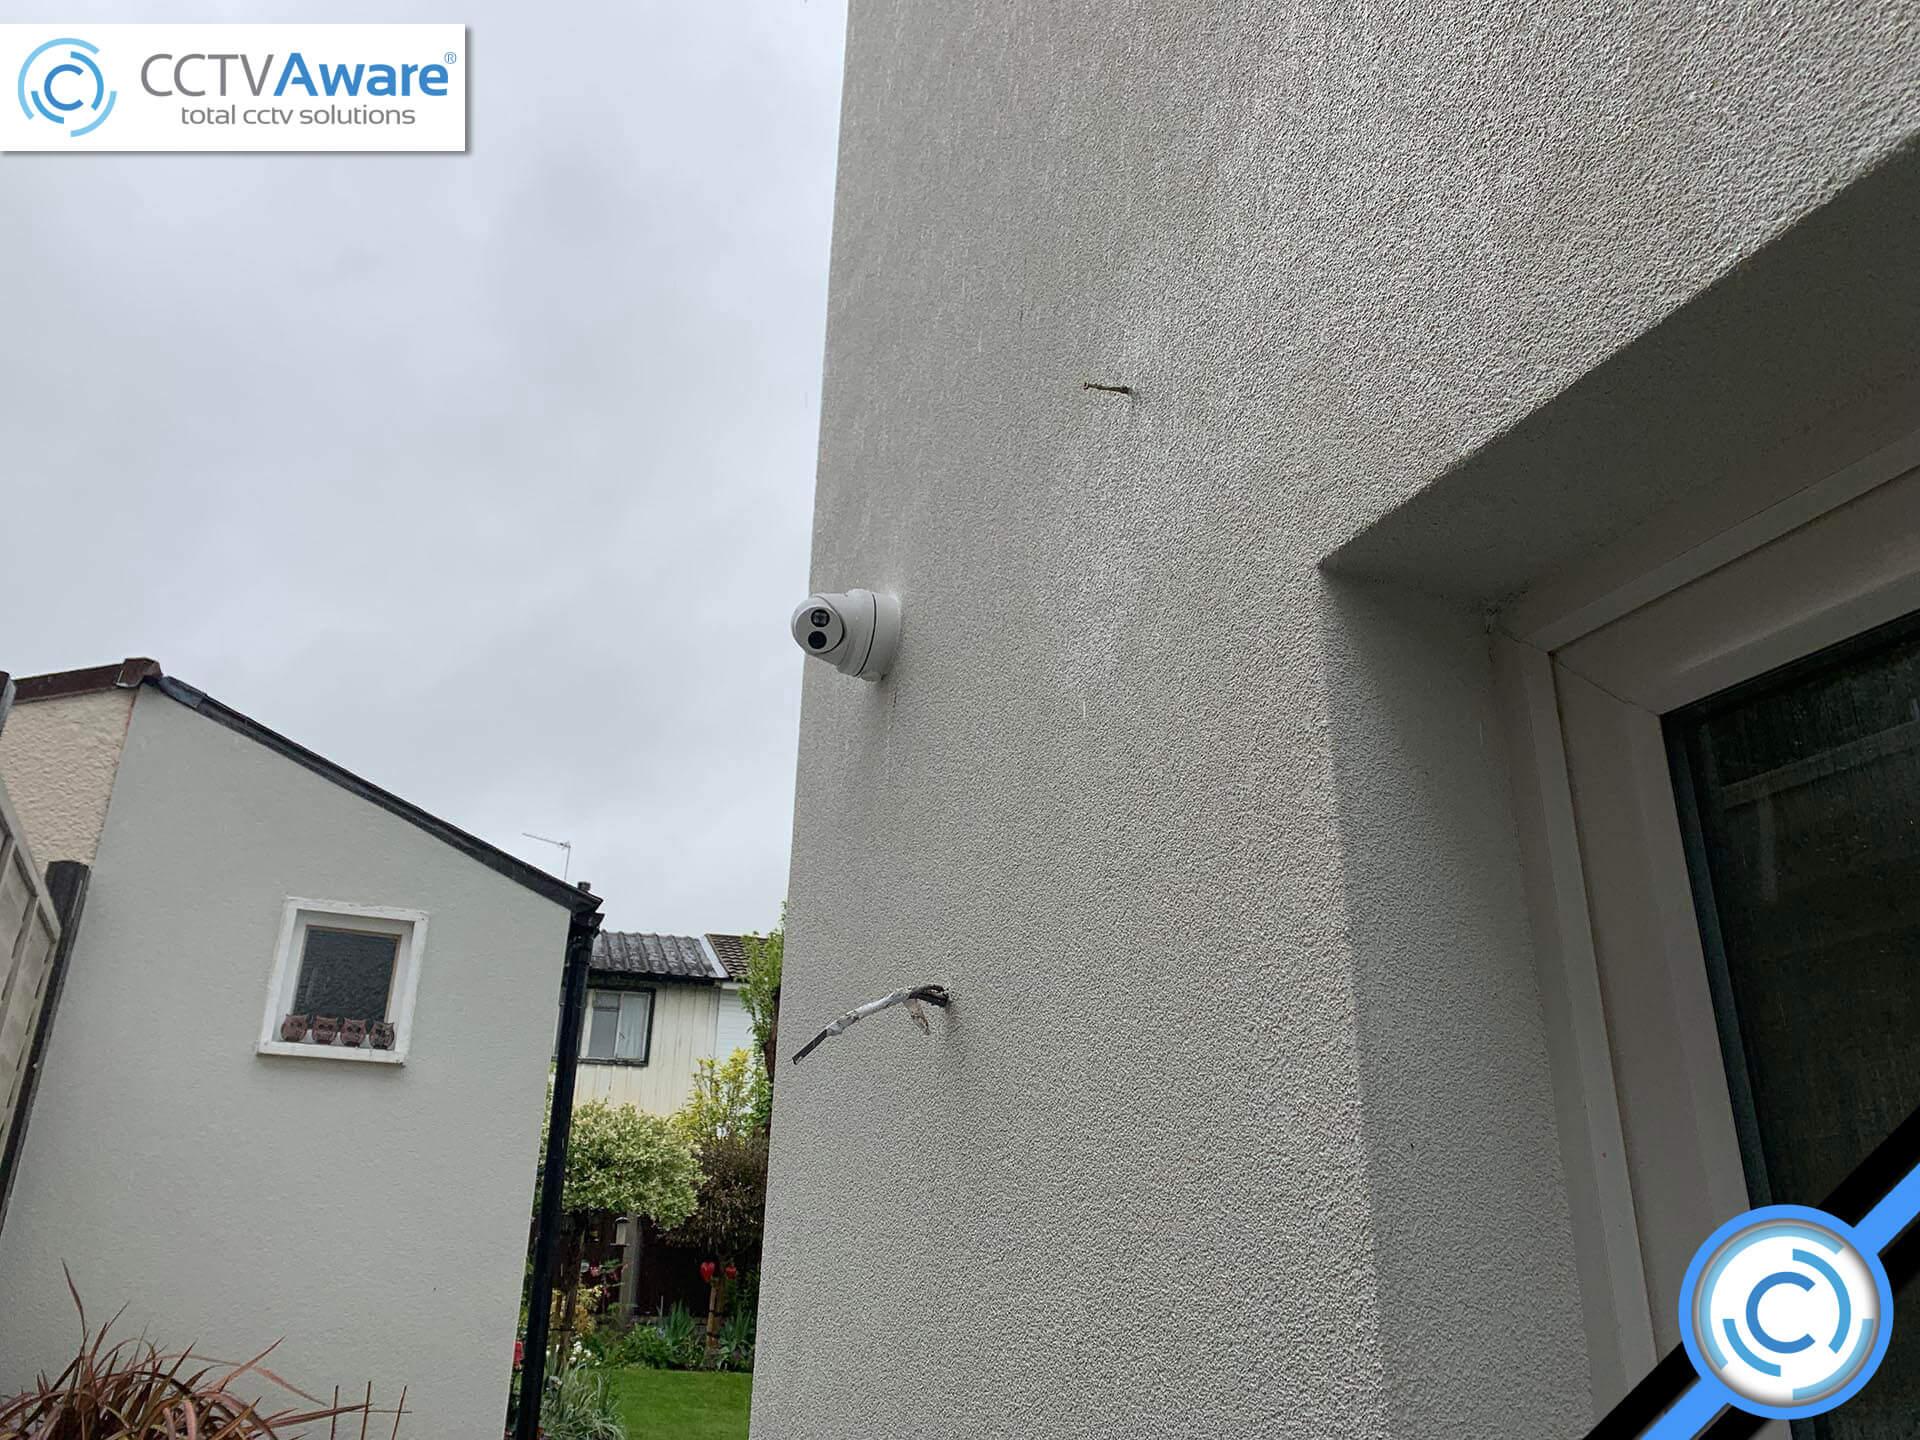 6MP CCTV Installation in Loughton, Essex